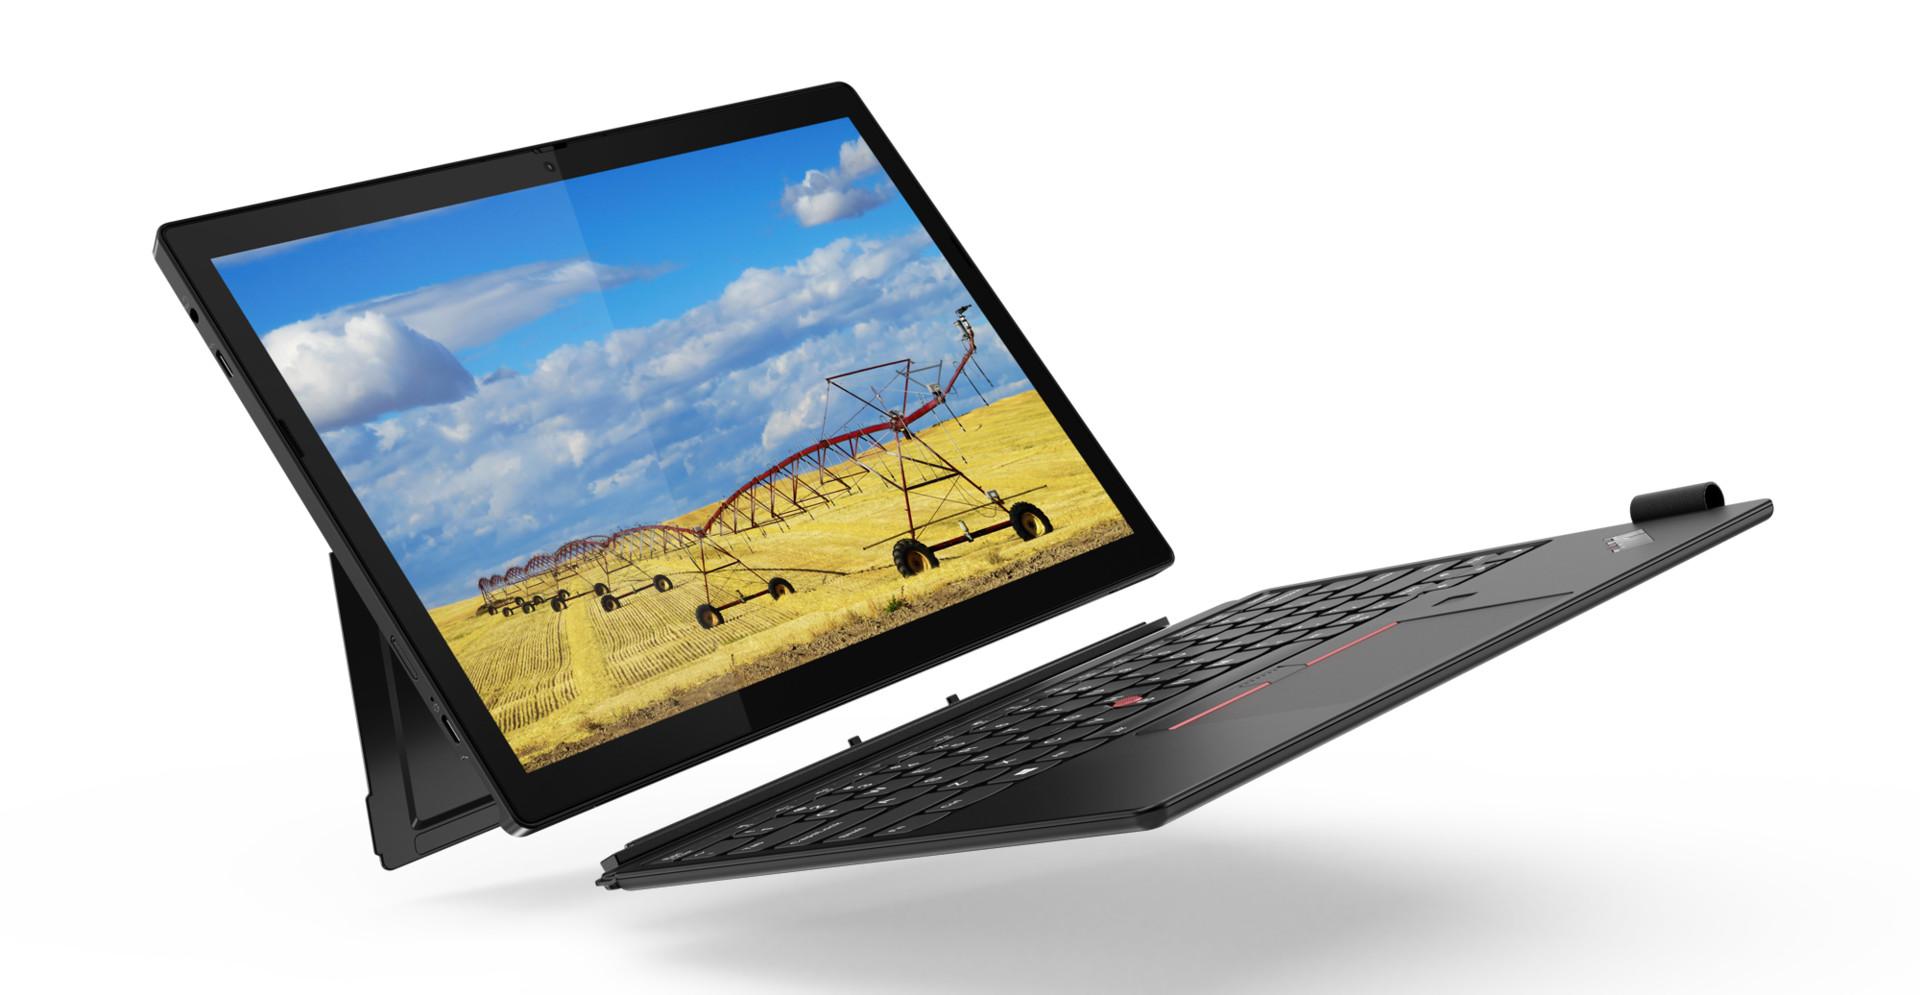 Lenovo ThinkPad X12 2021 tablet/detachable – Surface Pro on steroids